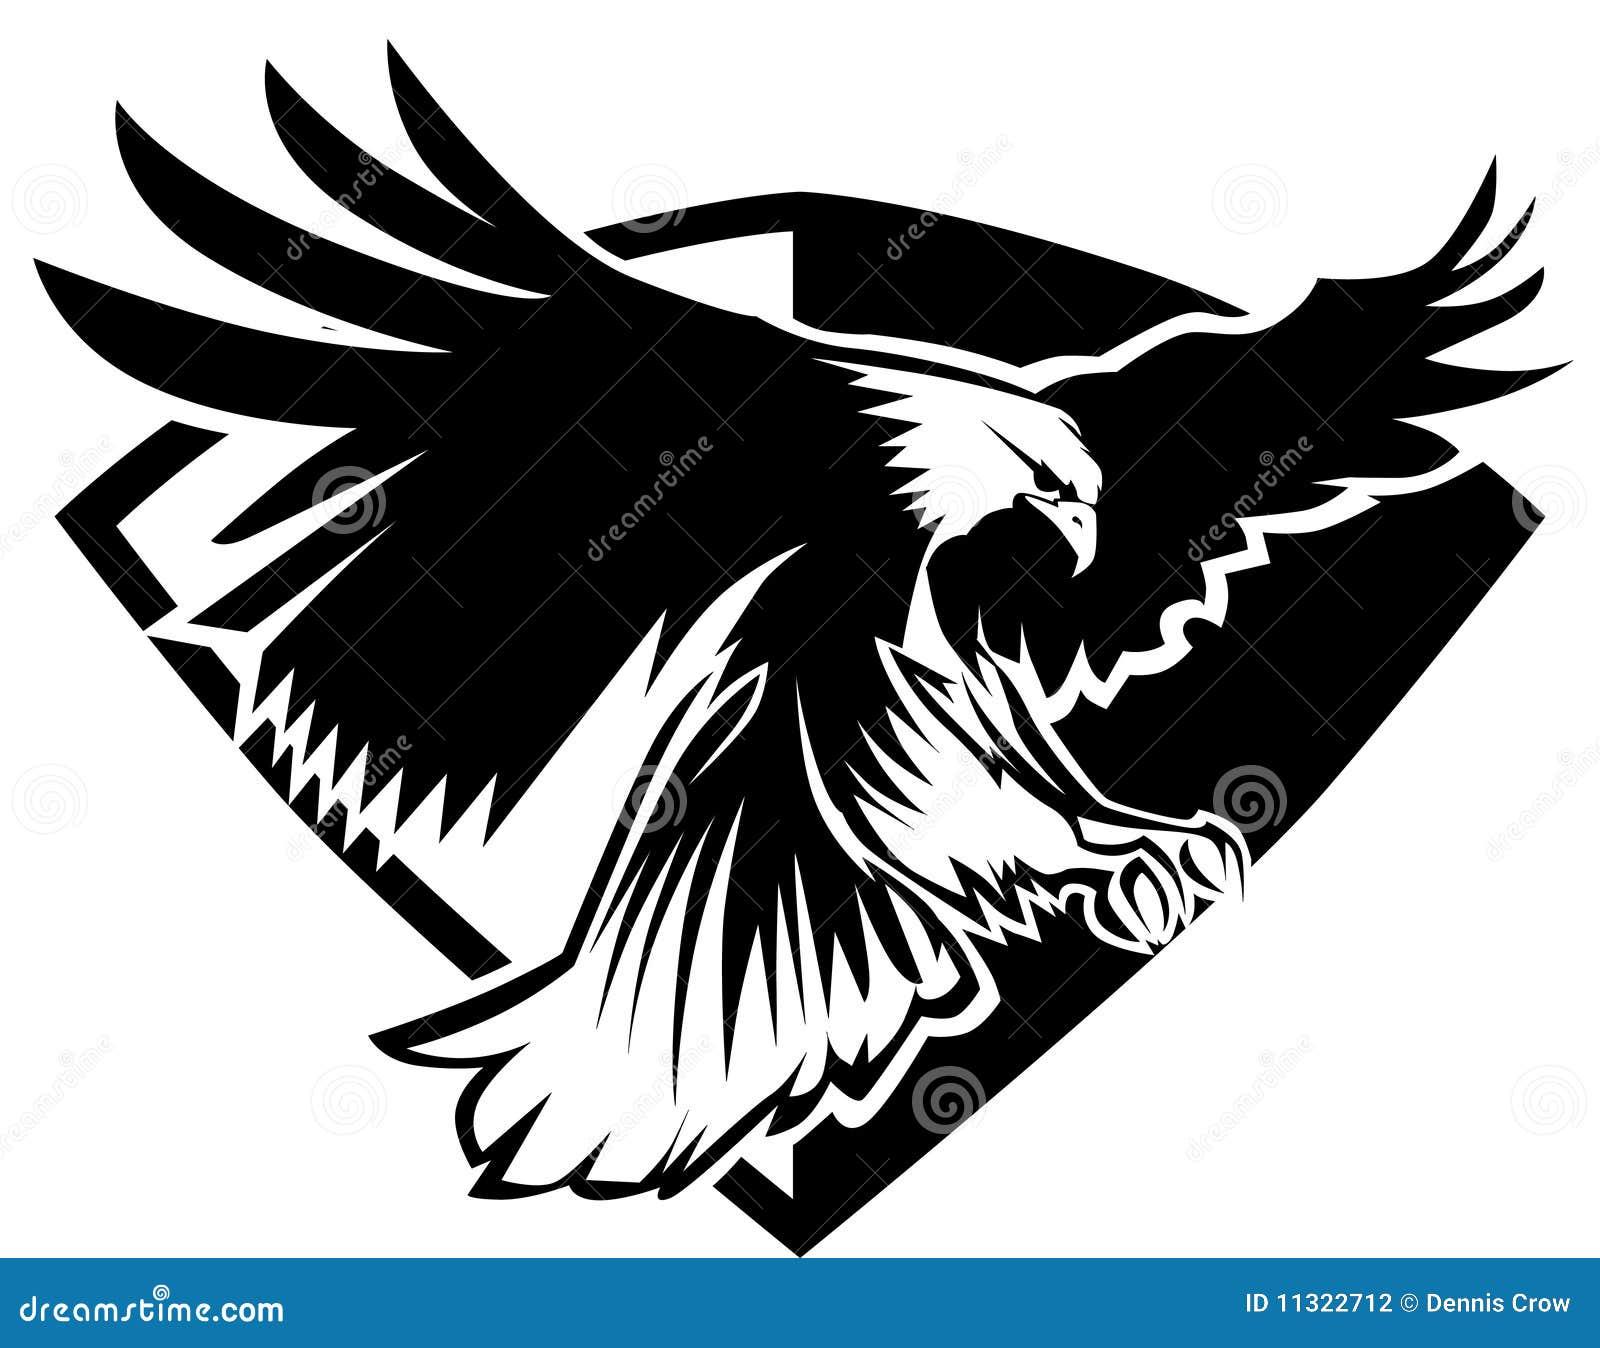 Eagle Logo Royalty Free Stock Photos - Image: 25026518